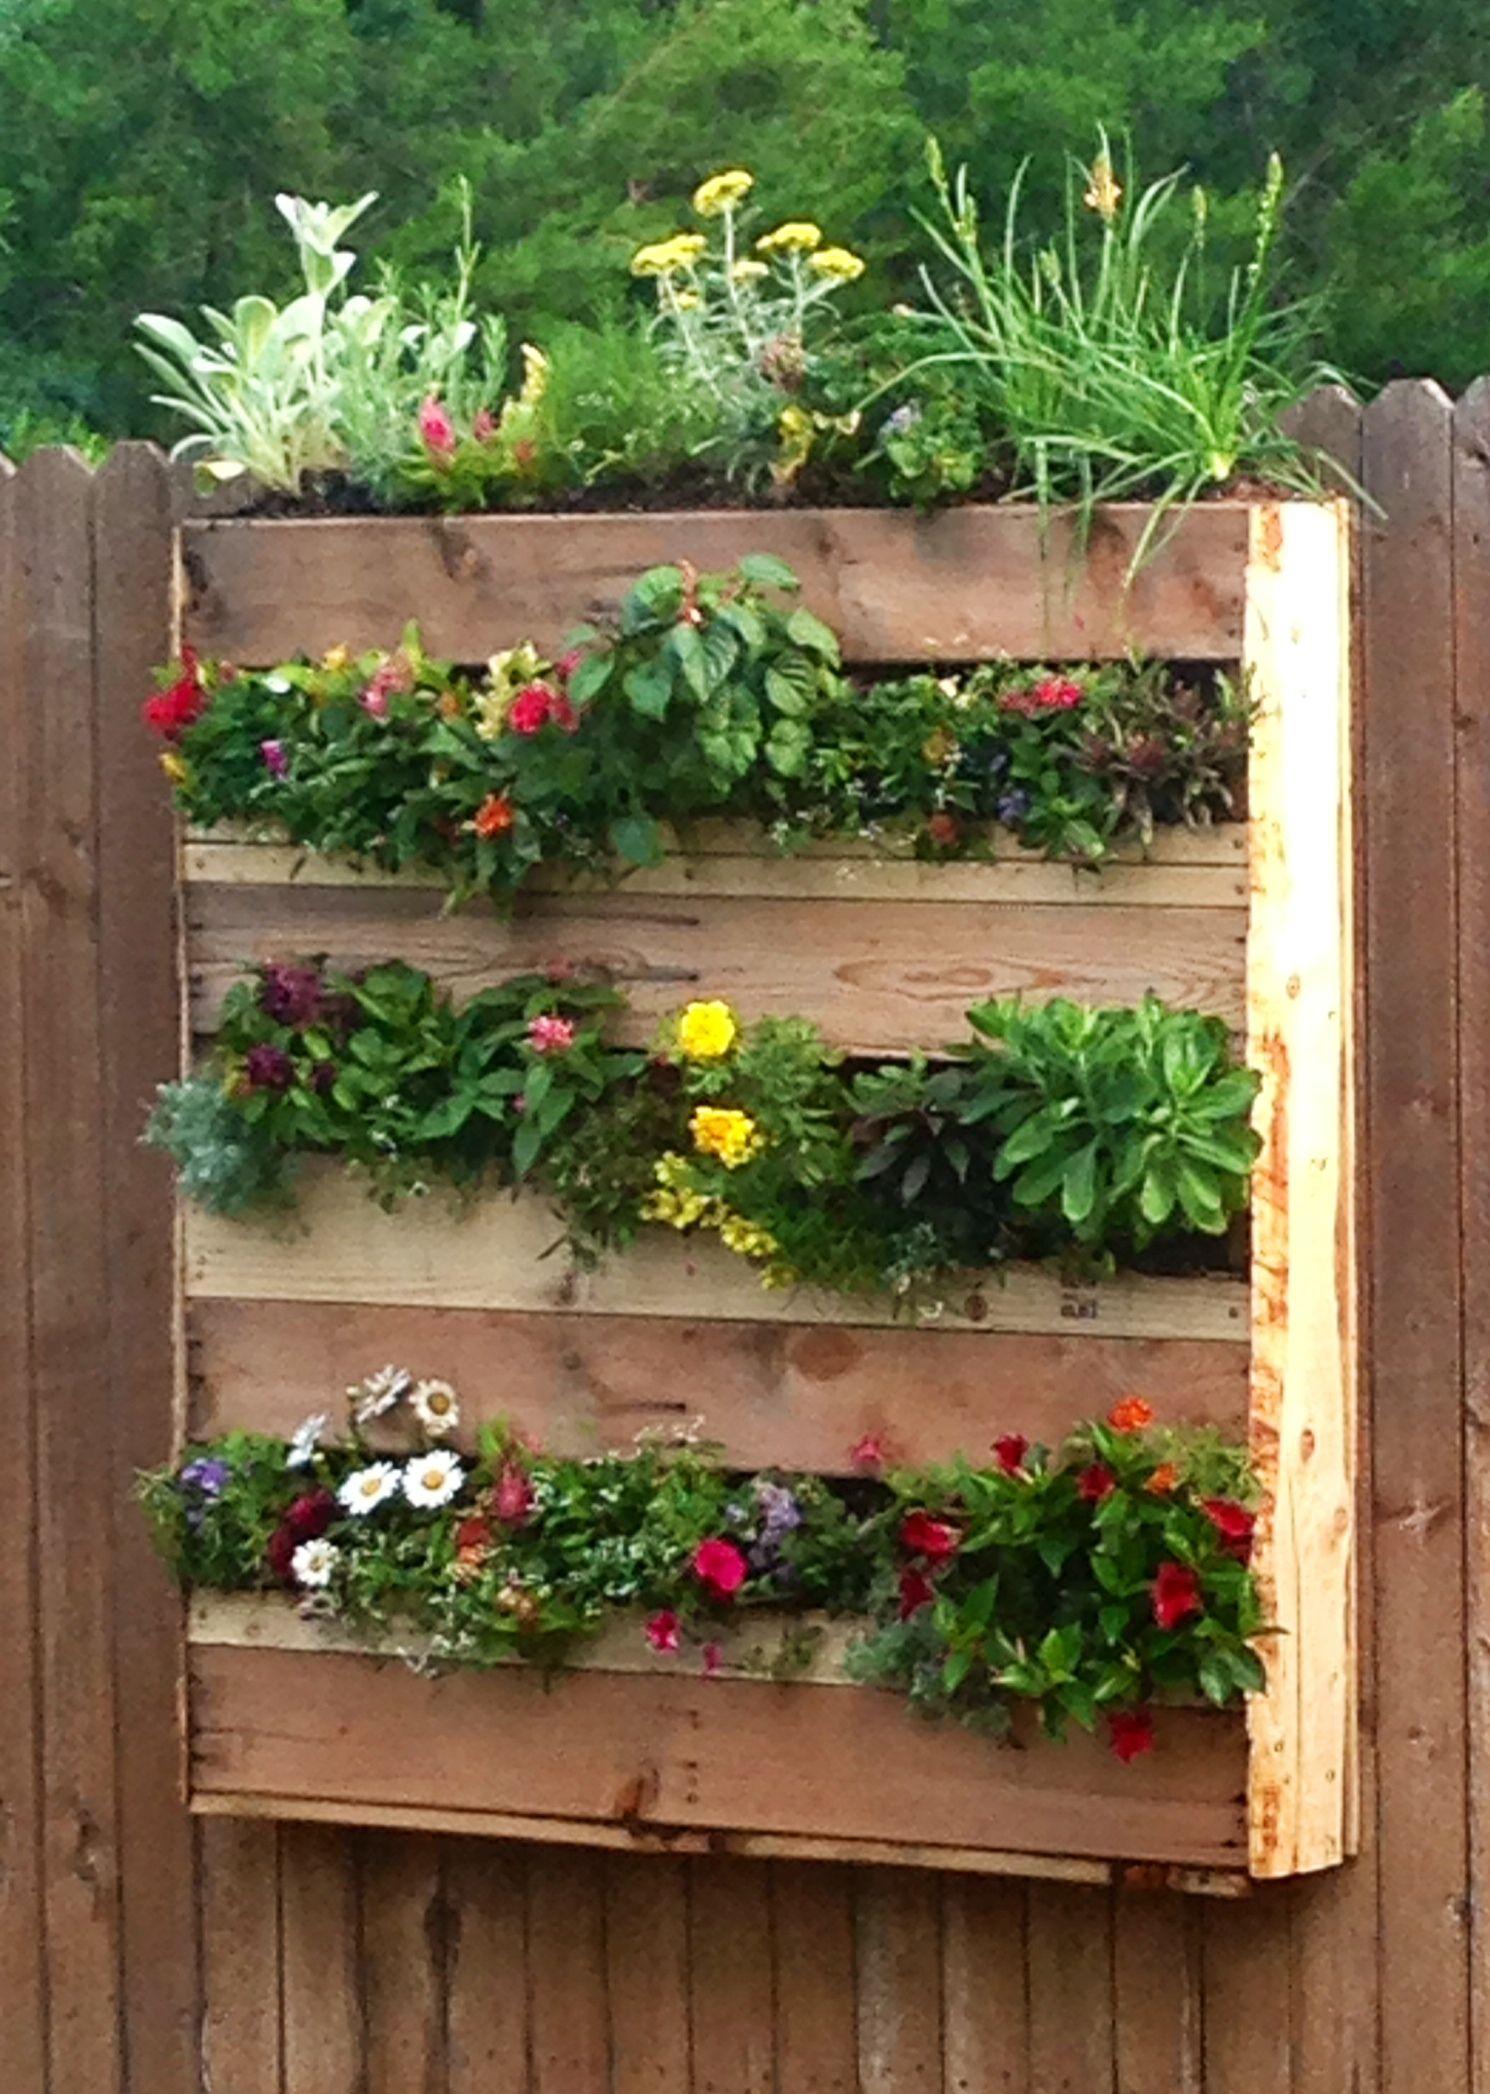 Vertical Pallet Flower Box Garden. Added Landscape Fabric